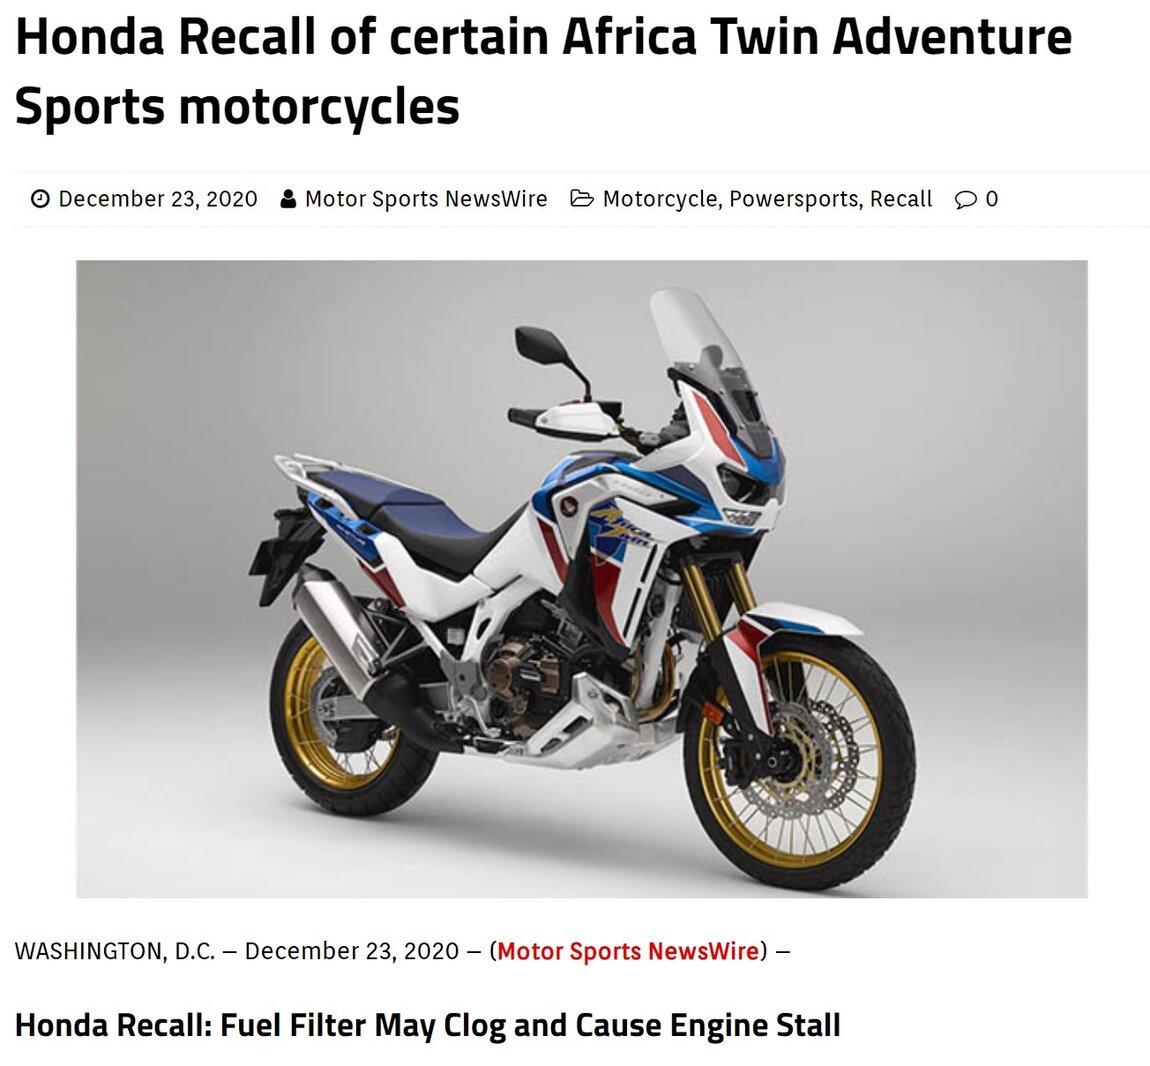 Honda Africa Twin Recall.jpg